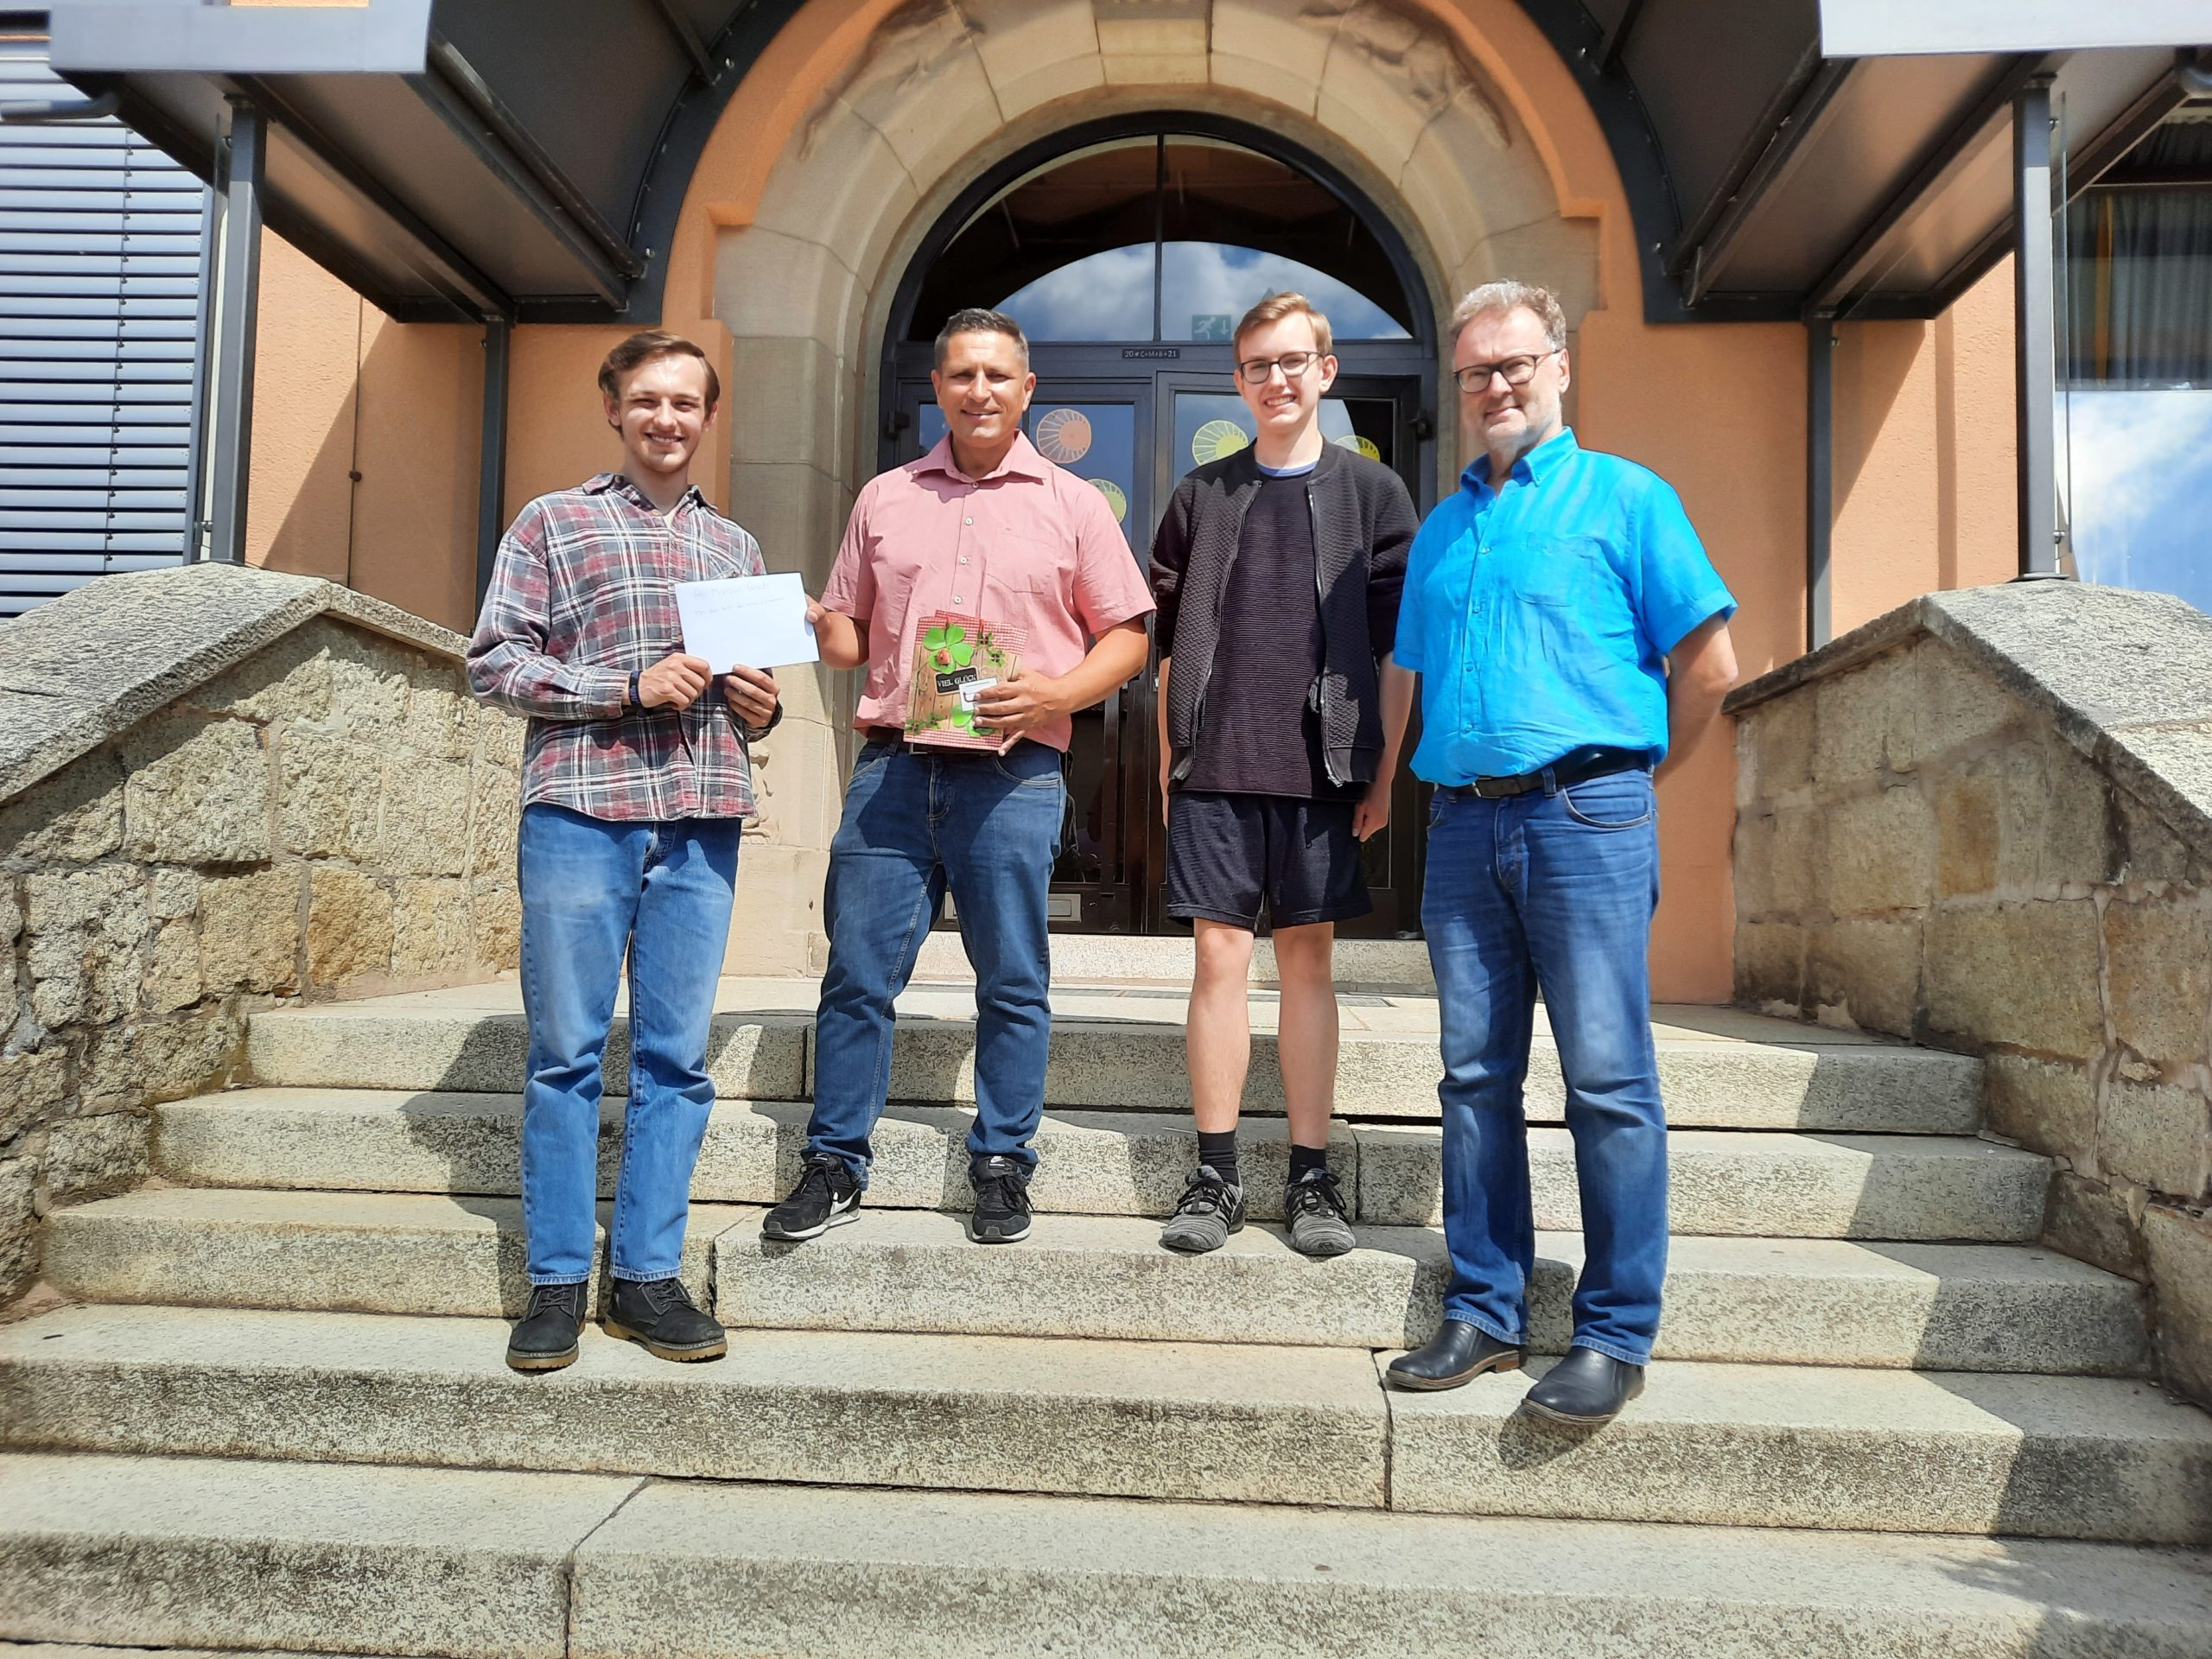 Read more about the article Schüler der M10 übergeben Einladung für Abschluss-/Entlassfeier an Bürgermeister Gradl